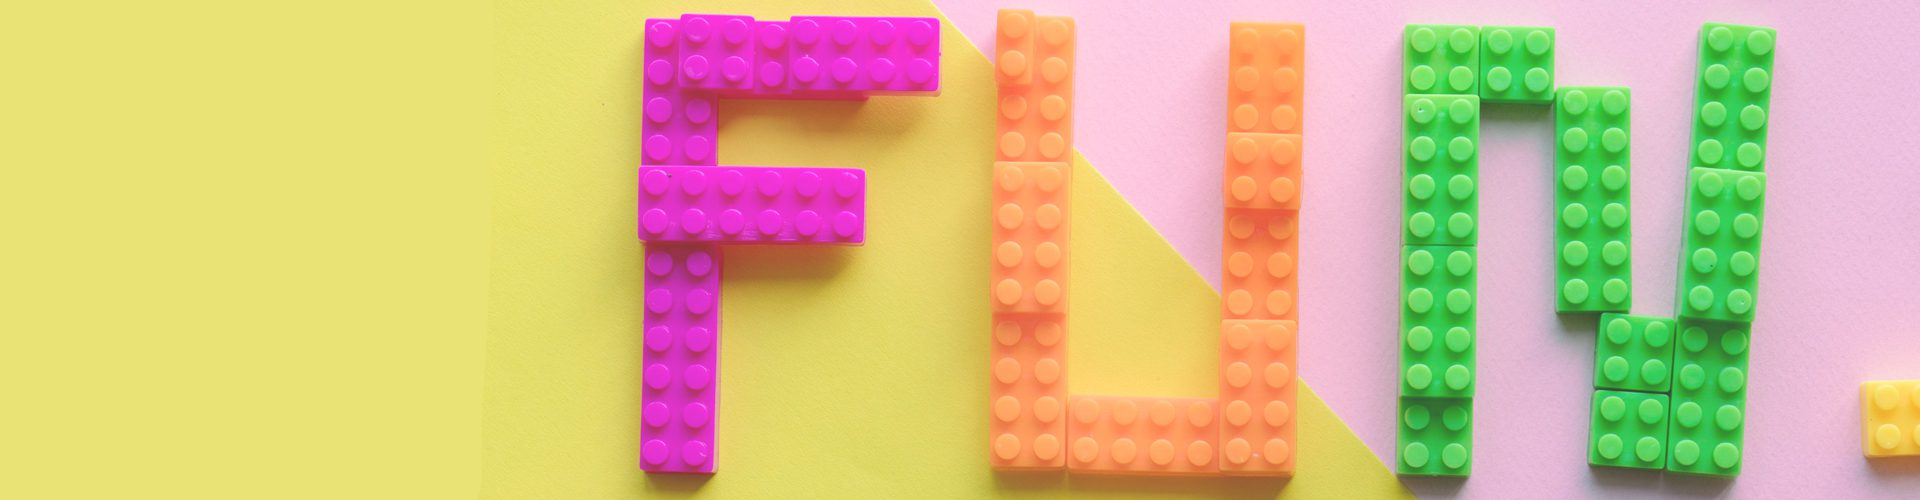 how to make a lego wall - FUN written in lego blocks